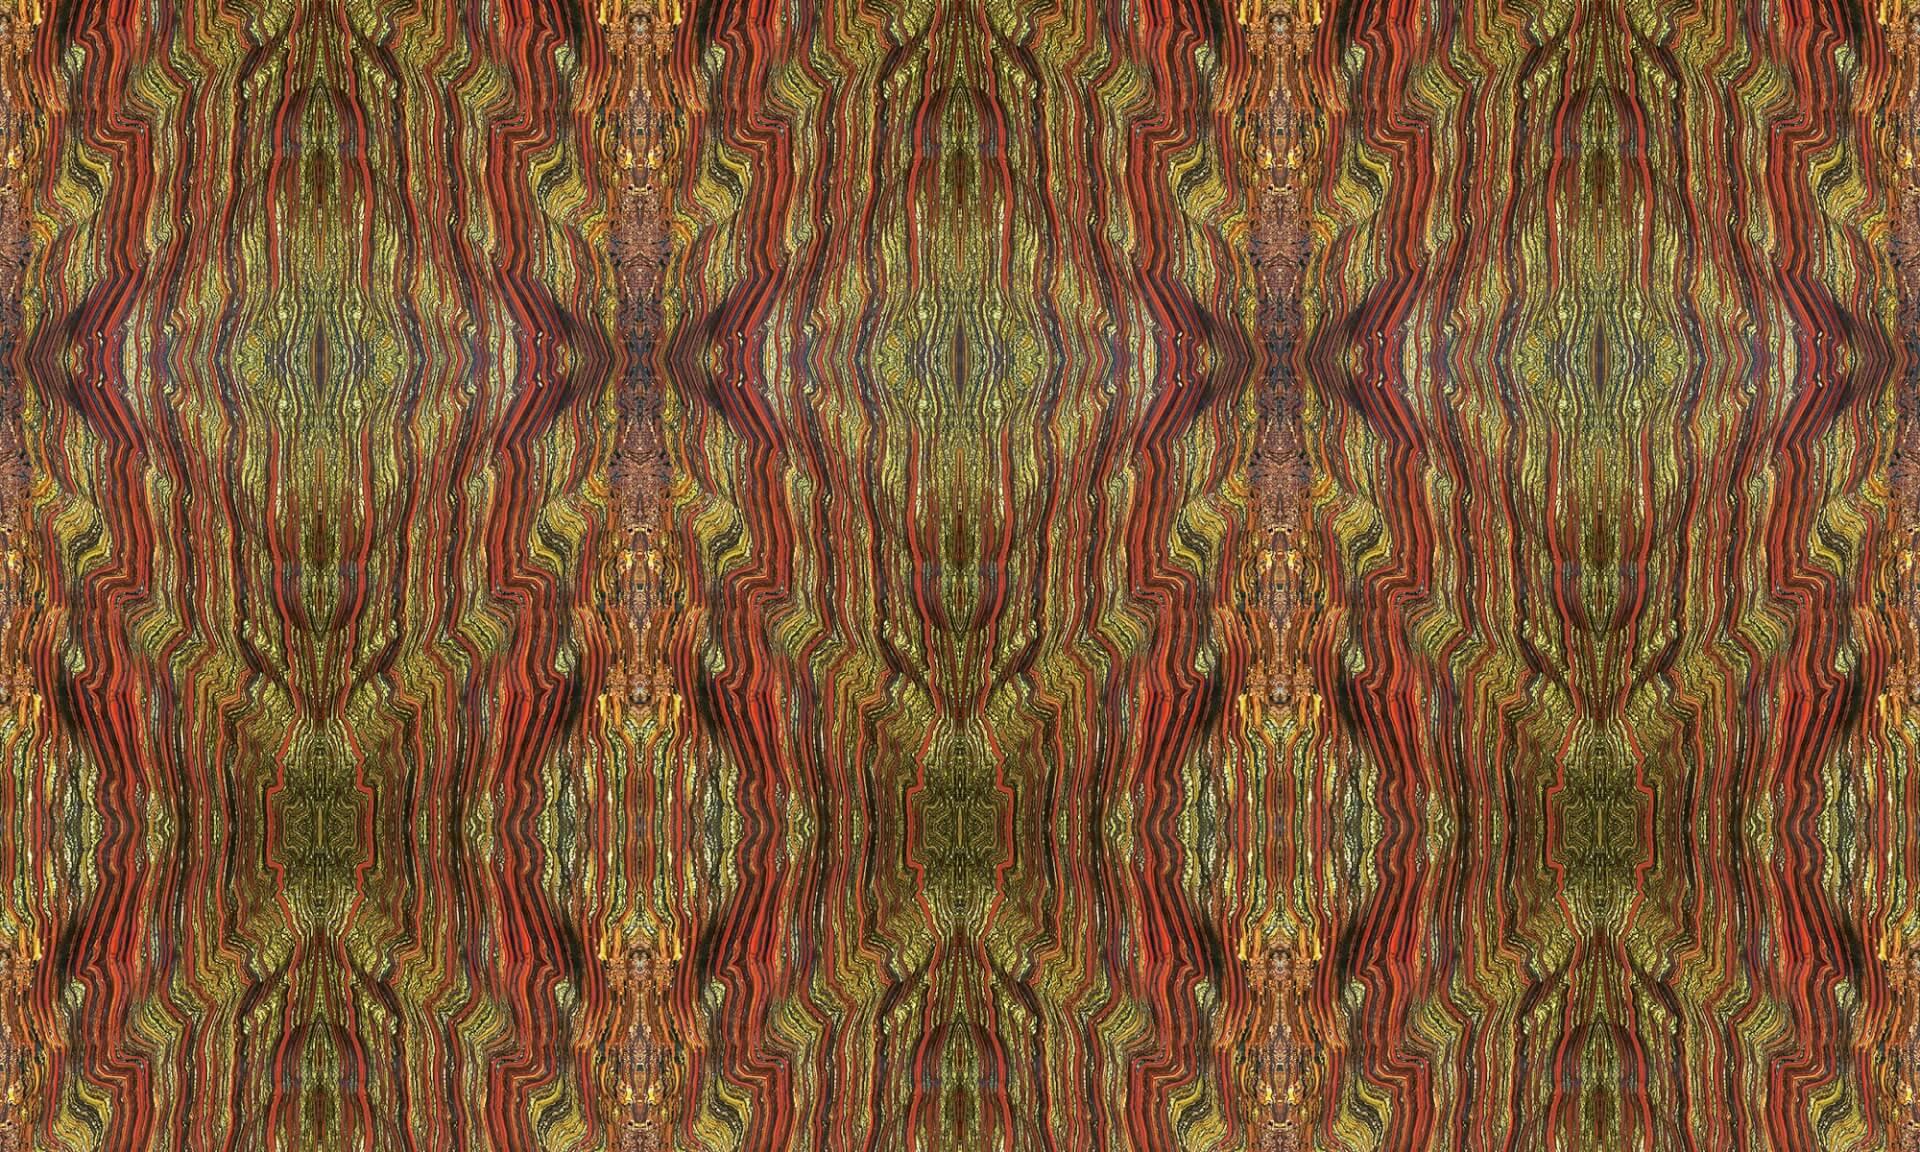 Rain Forest Doug Garrabrants